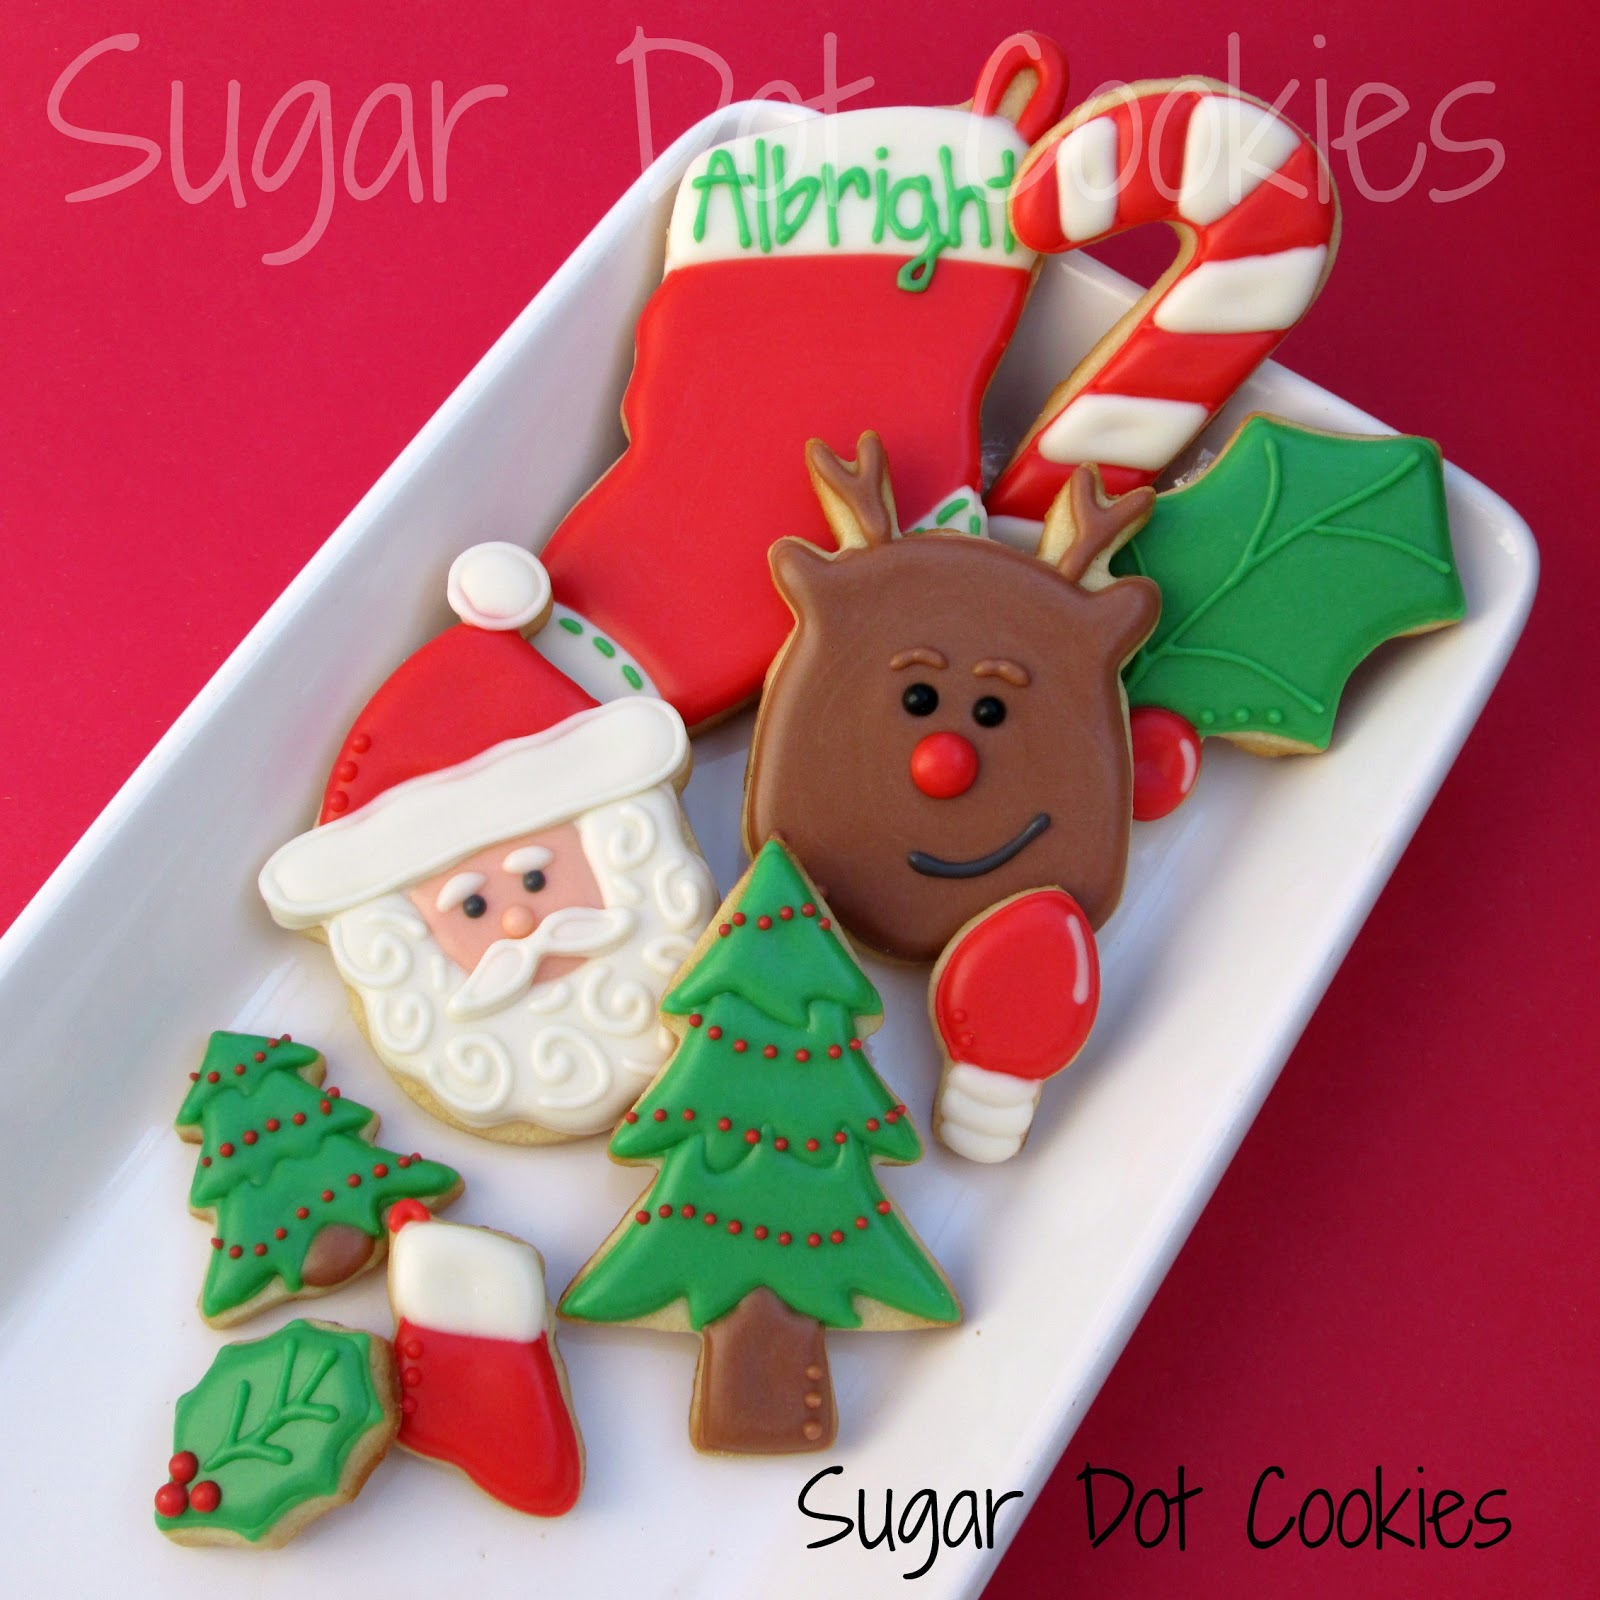 Sugar Fairy Sweet: November 2012